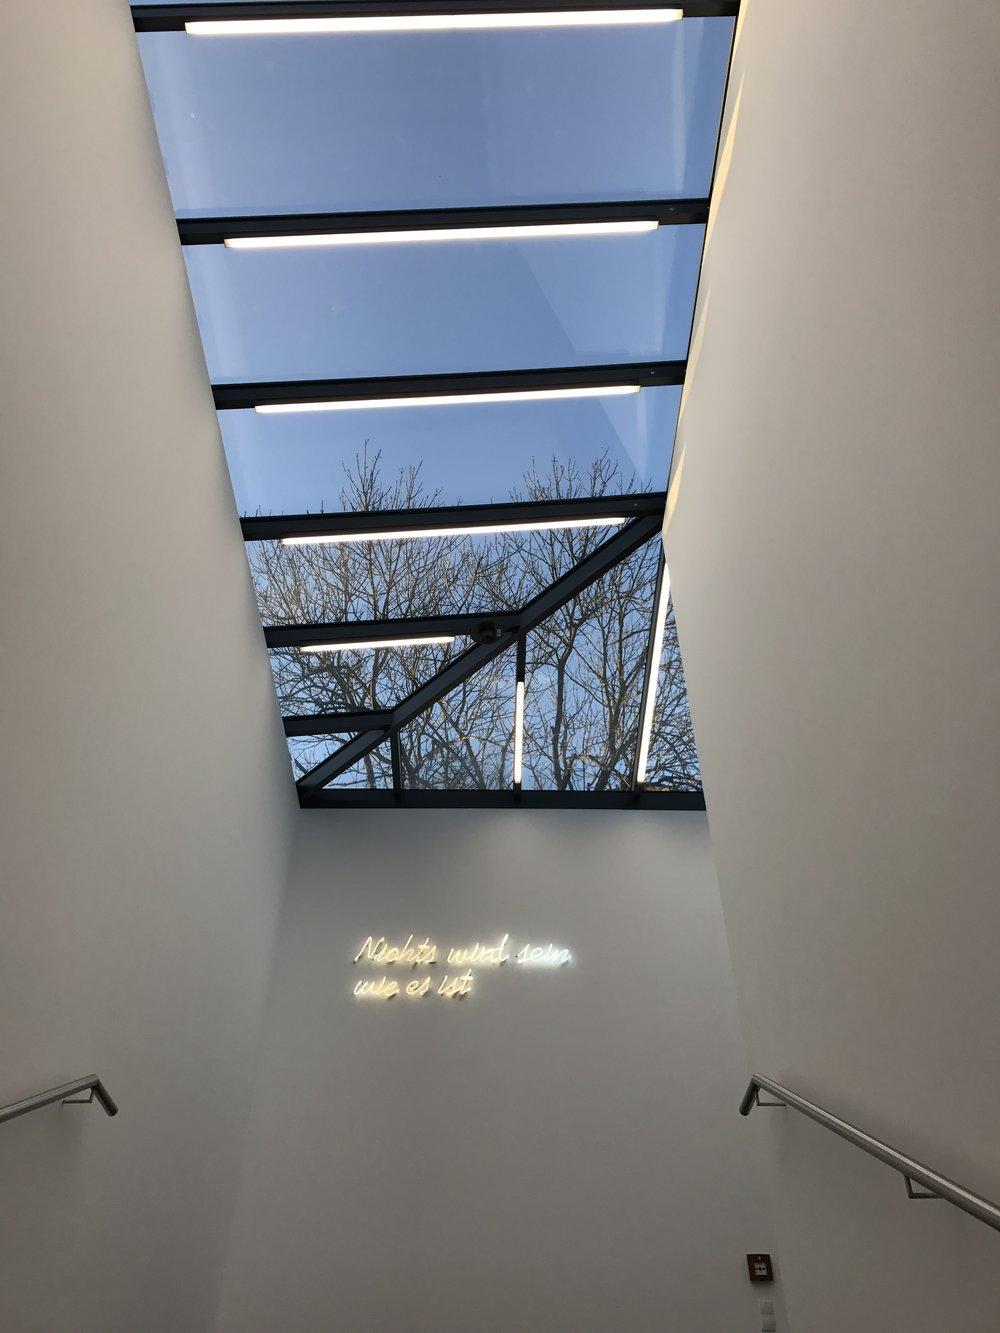 Museum unter Tage, Bochum, De Museumpodcast